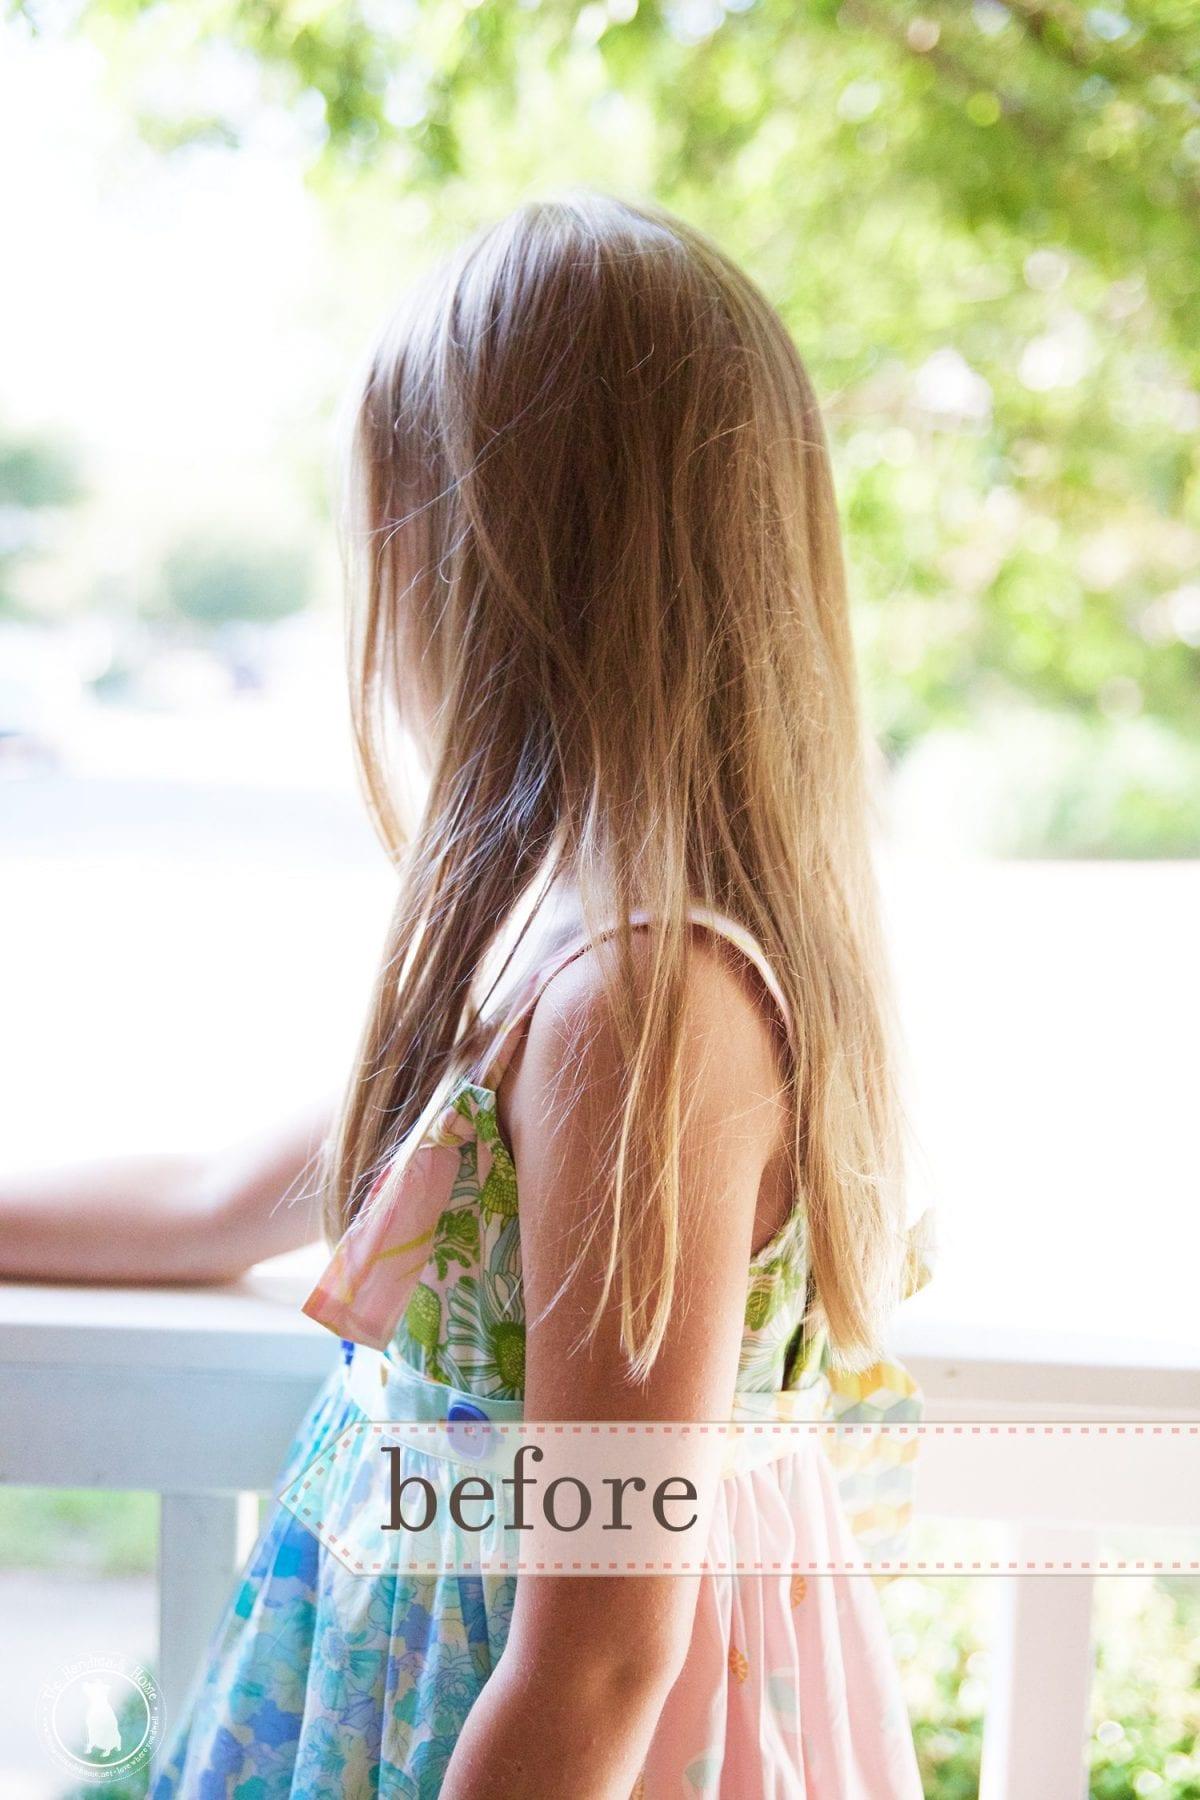 hair_girl_before